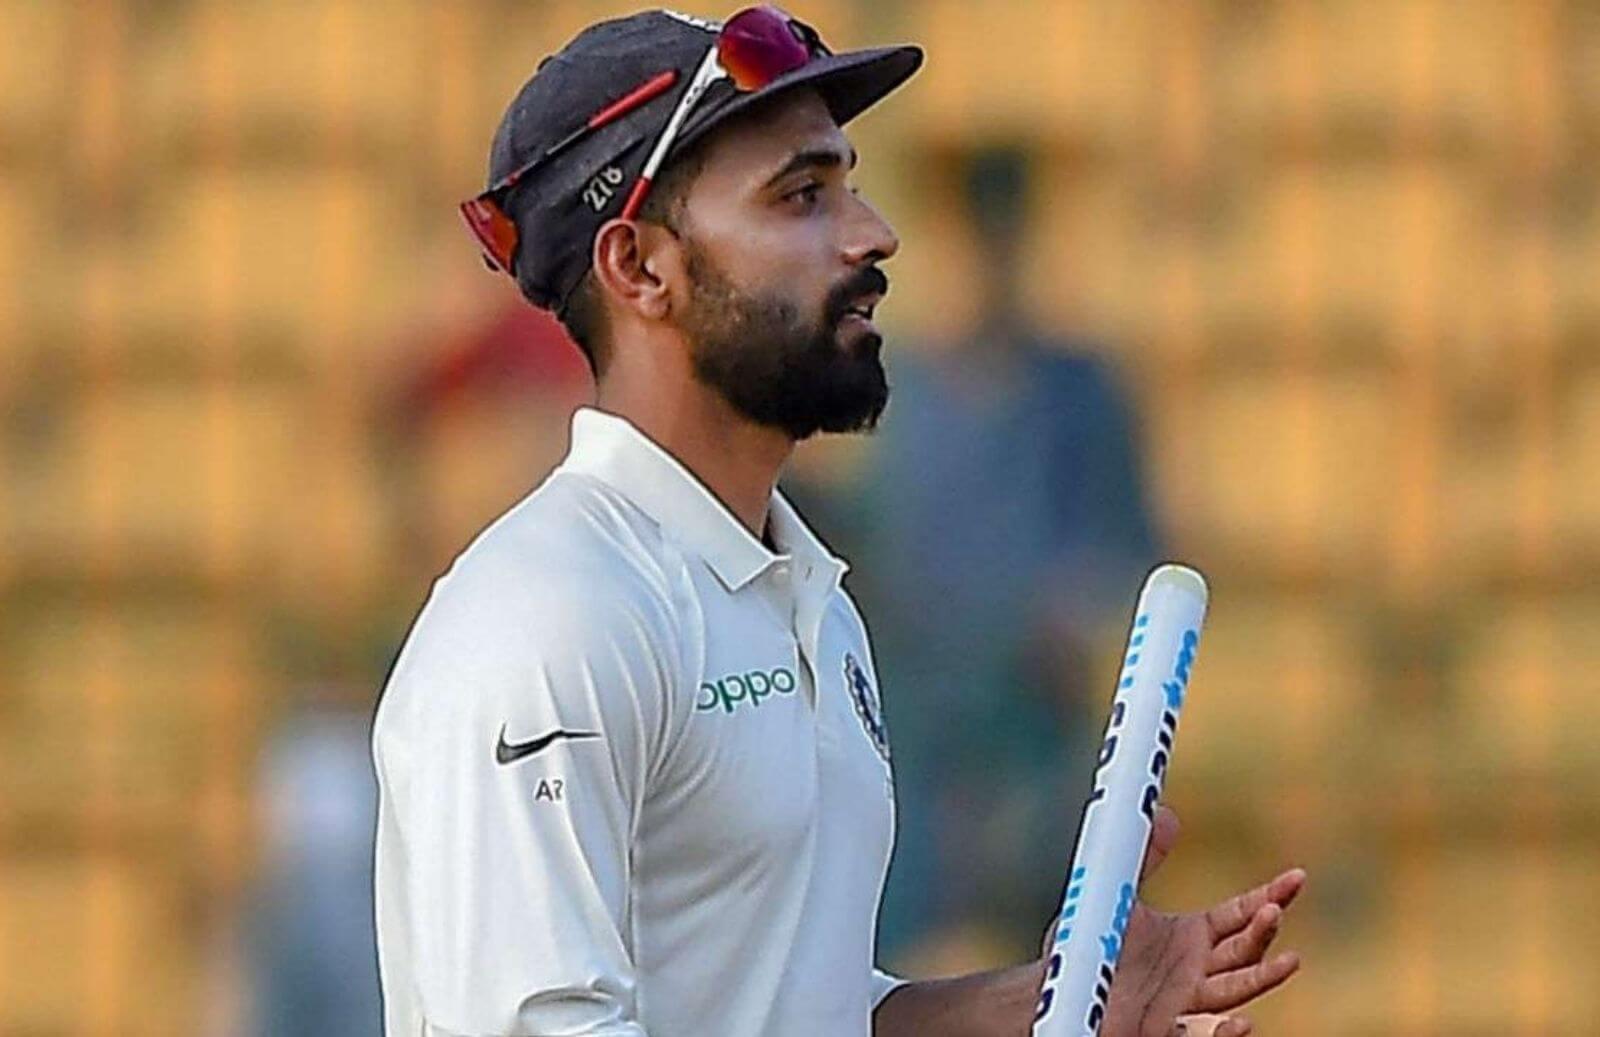 'Focus On The Process,'- Sachin Tendulkar Backs Ajinkya Rahane To Perform Well As Captain vs Australia